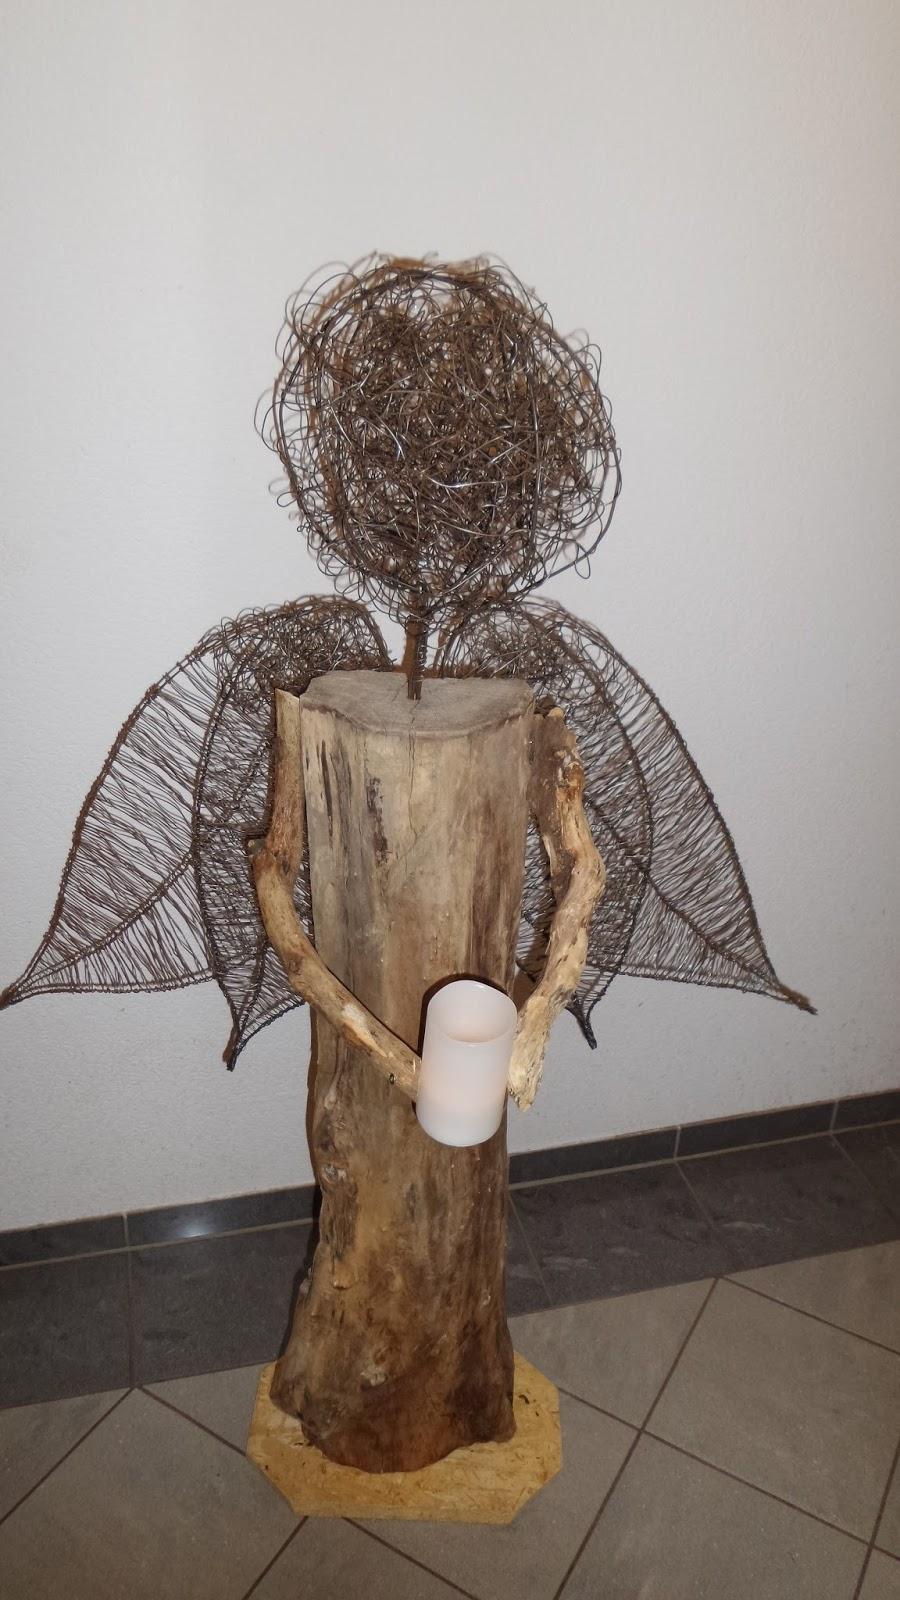 Willkommen bei frauhohmann: Draht Deko vor dem Haus - Draht flechten